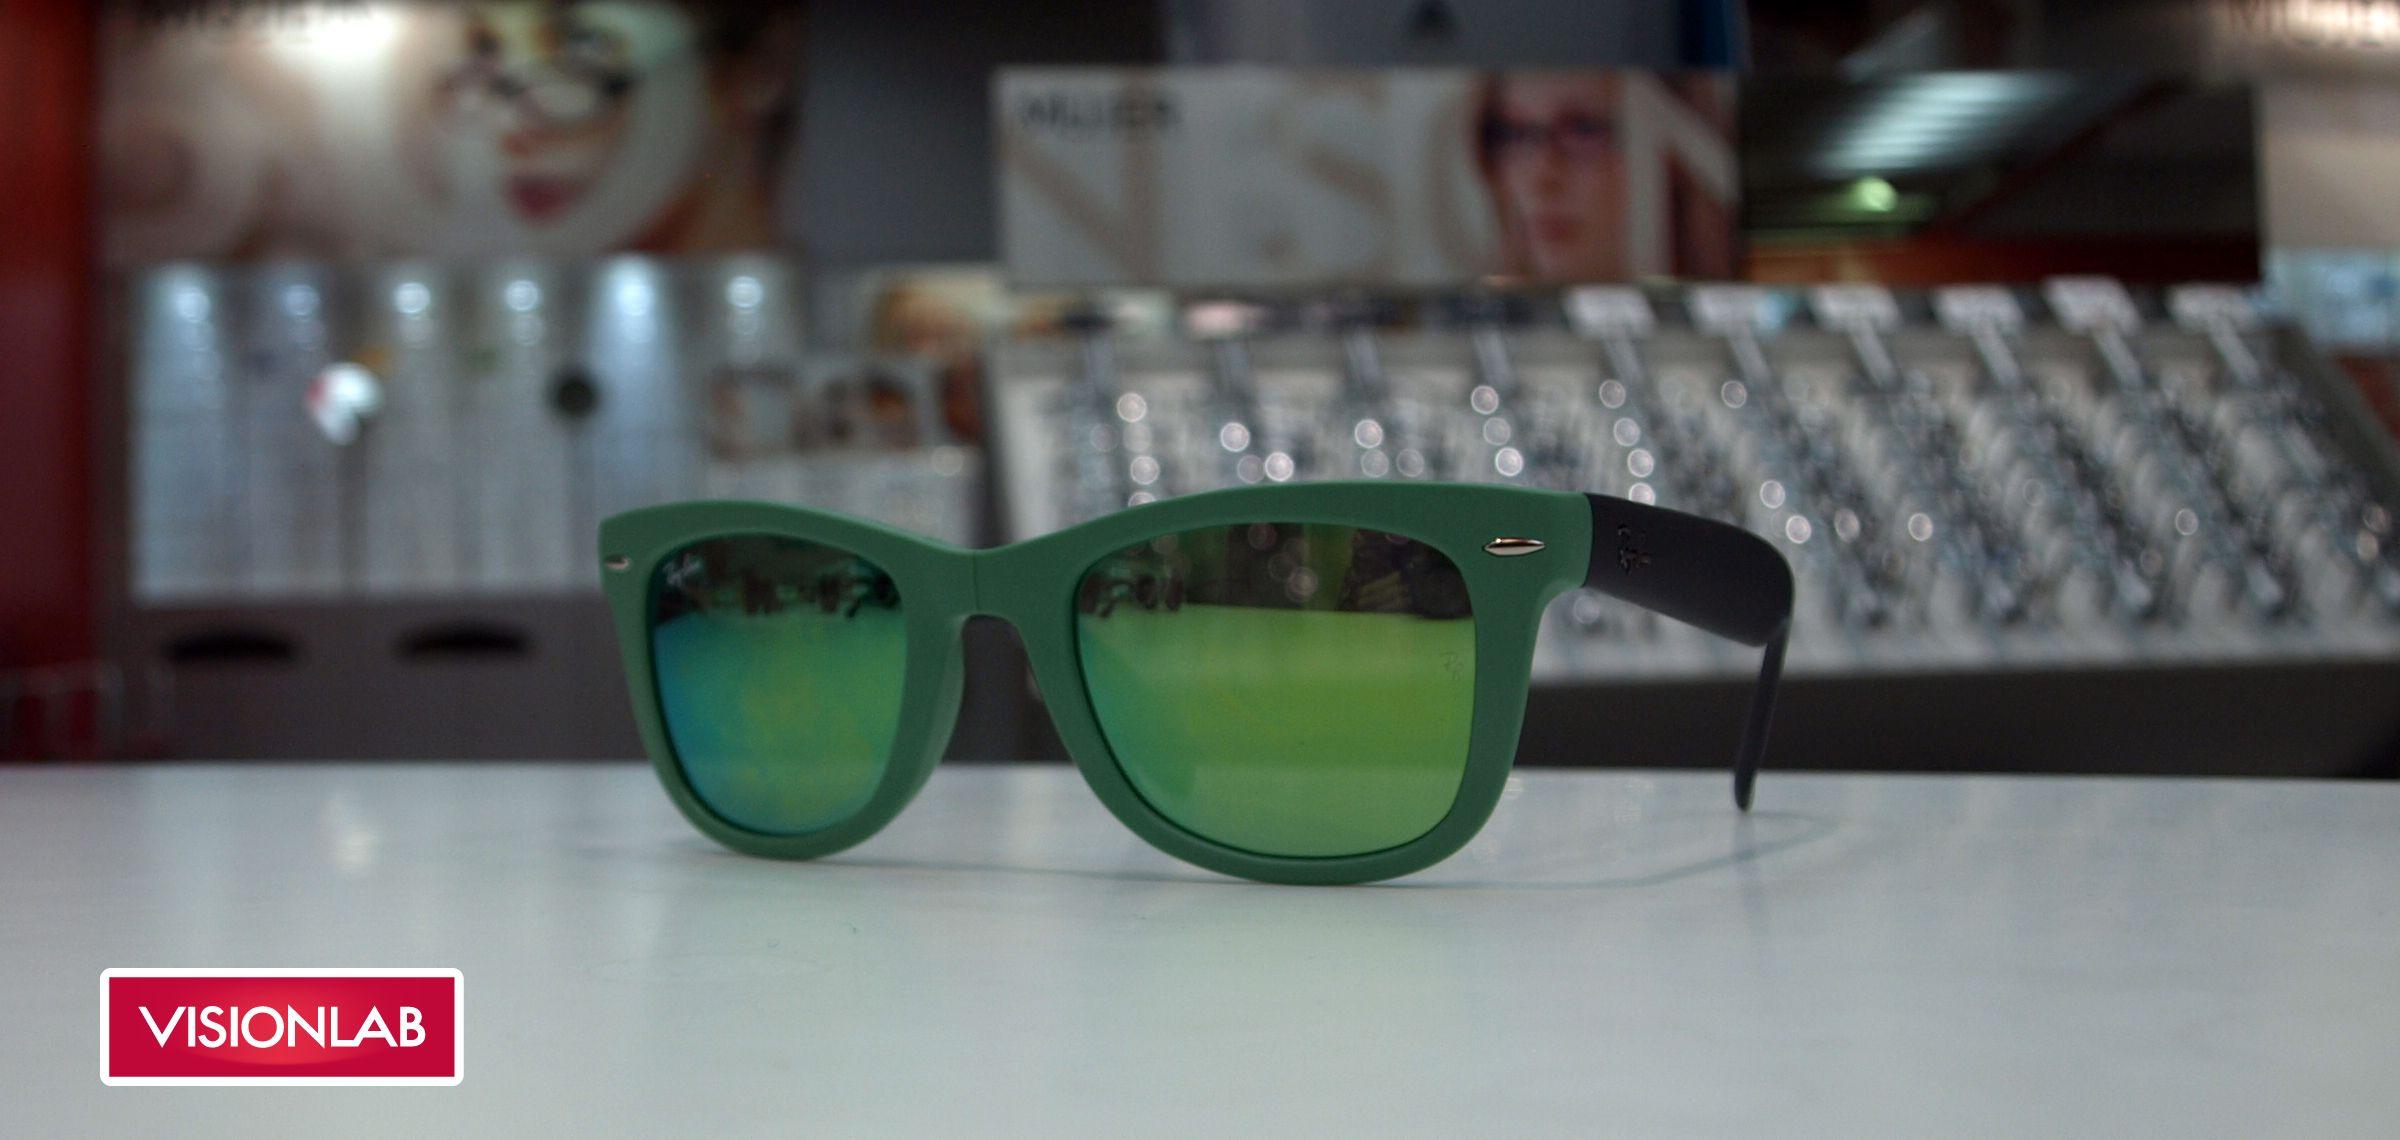 2cb02d1bb8 Gafas RayBan espejadas y plegables verdes http://www.visionlab.es/